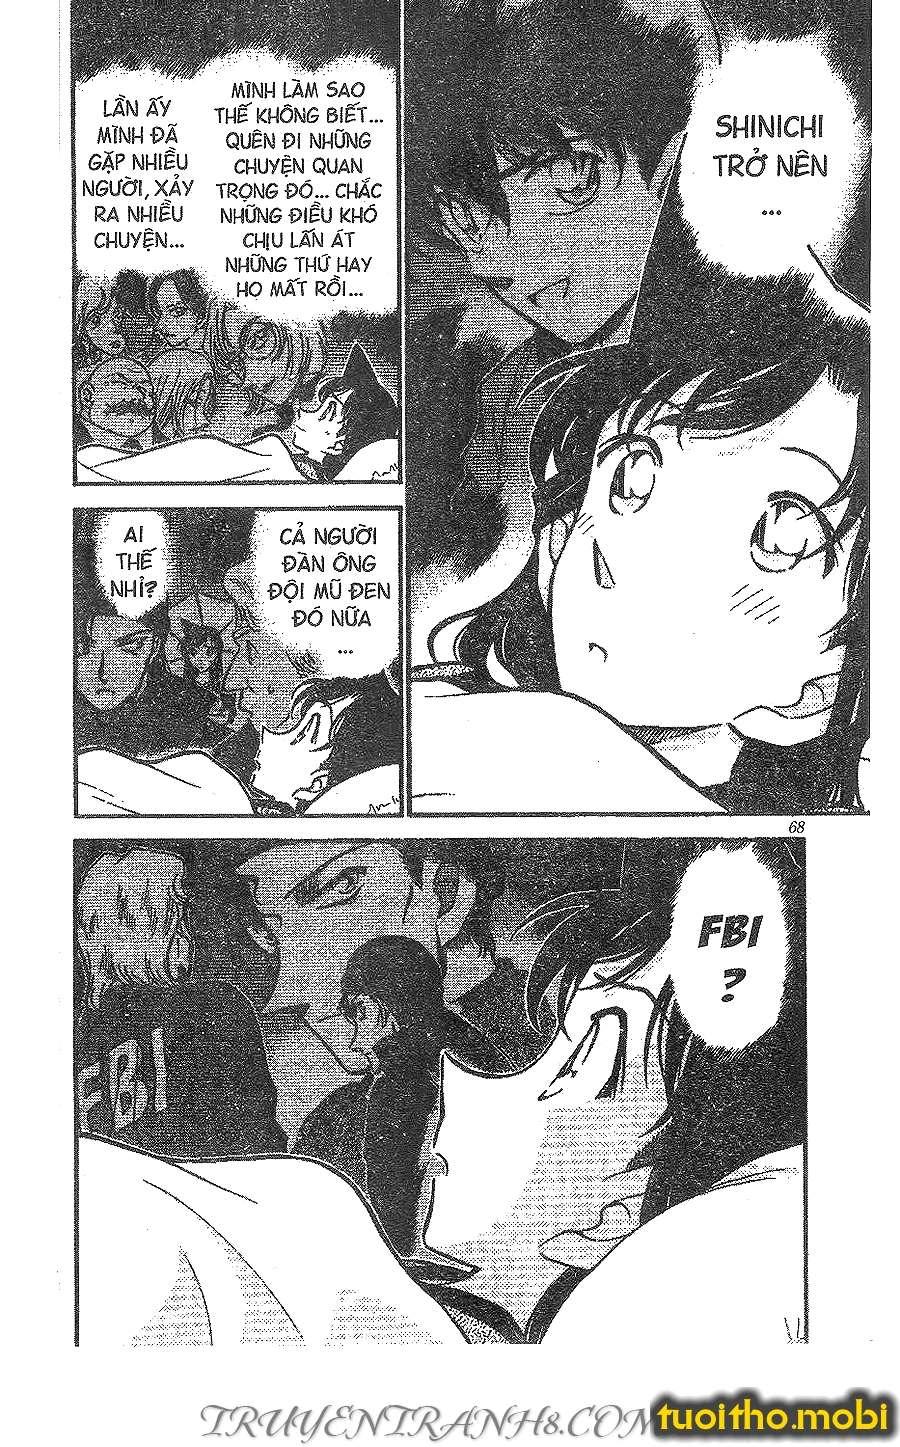 conan chương 354 trang 17